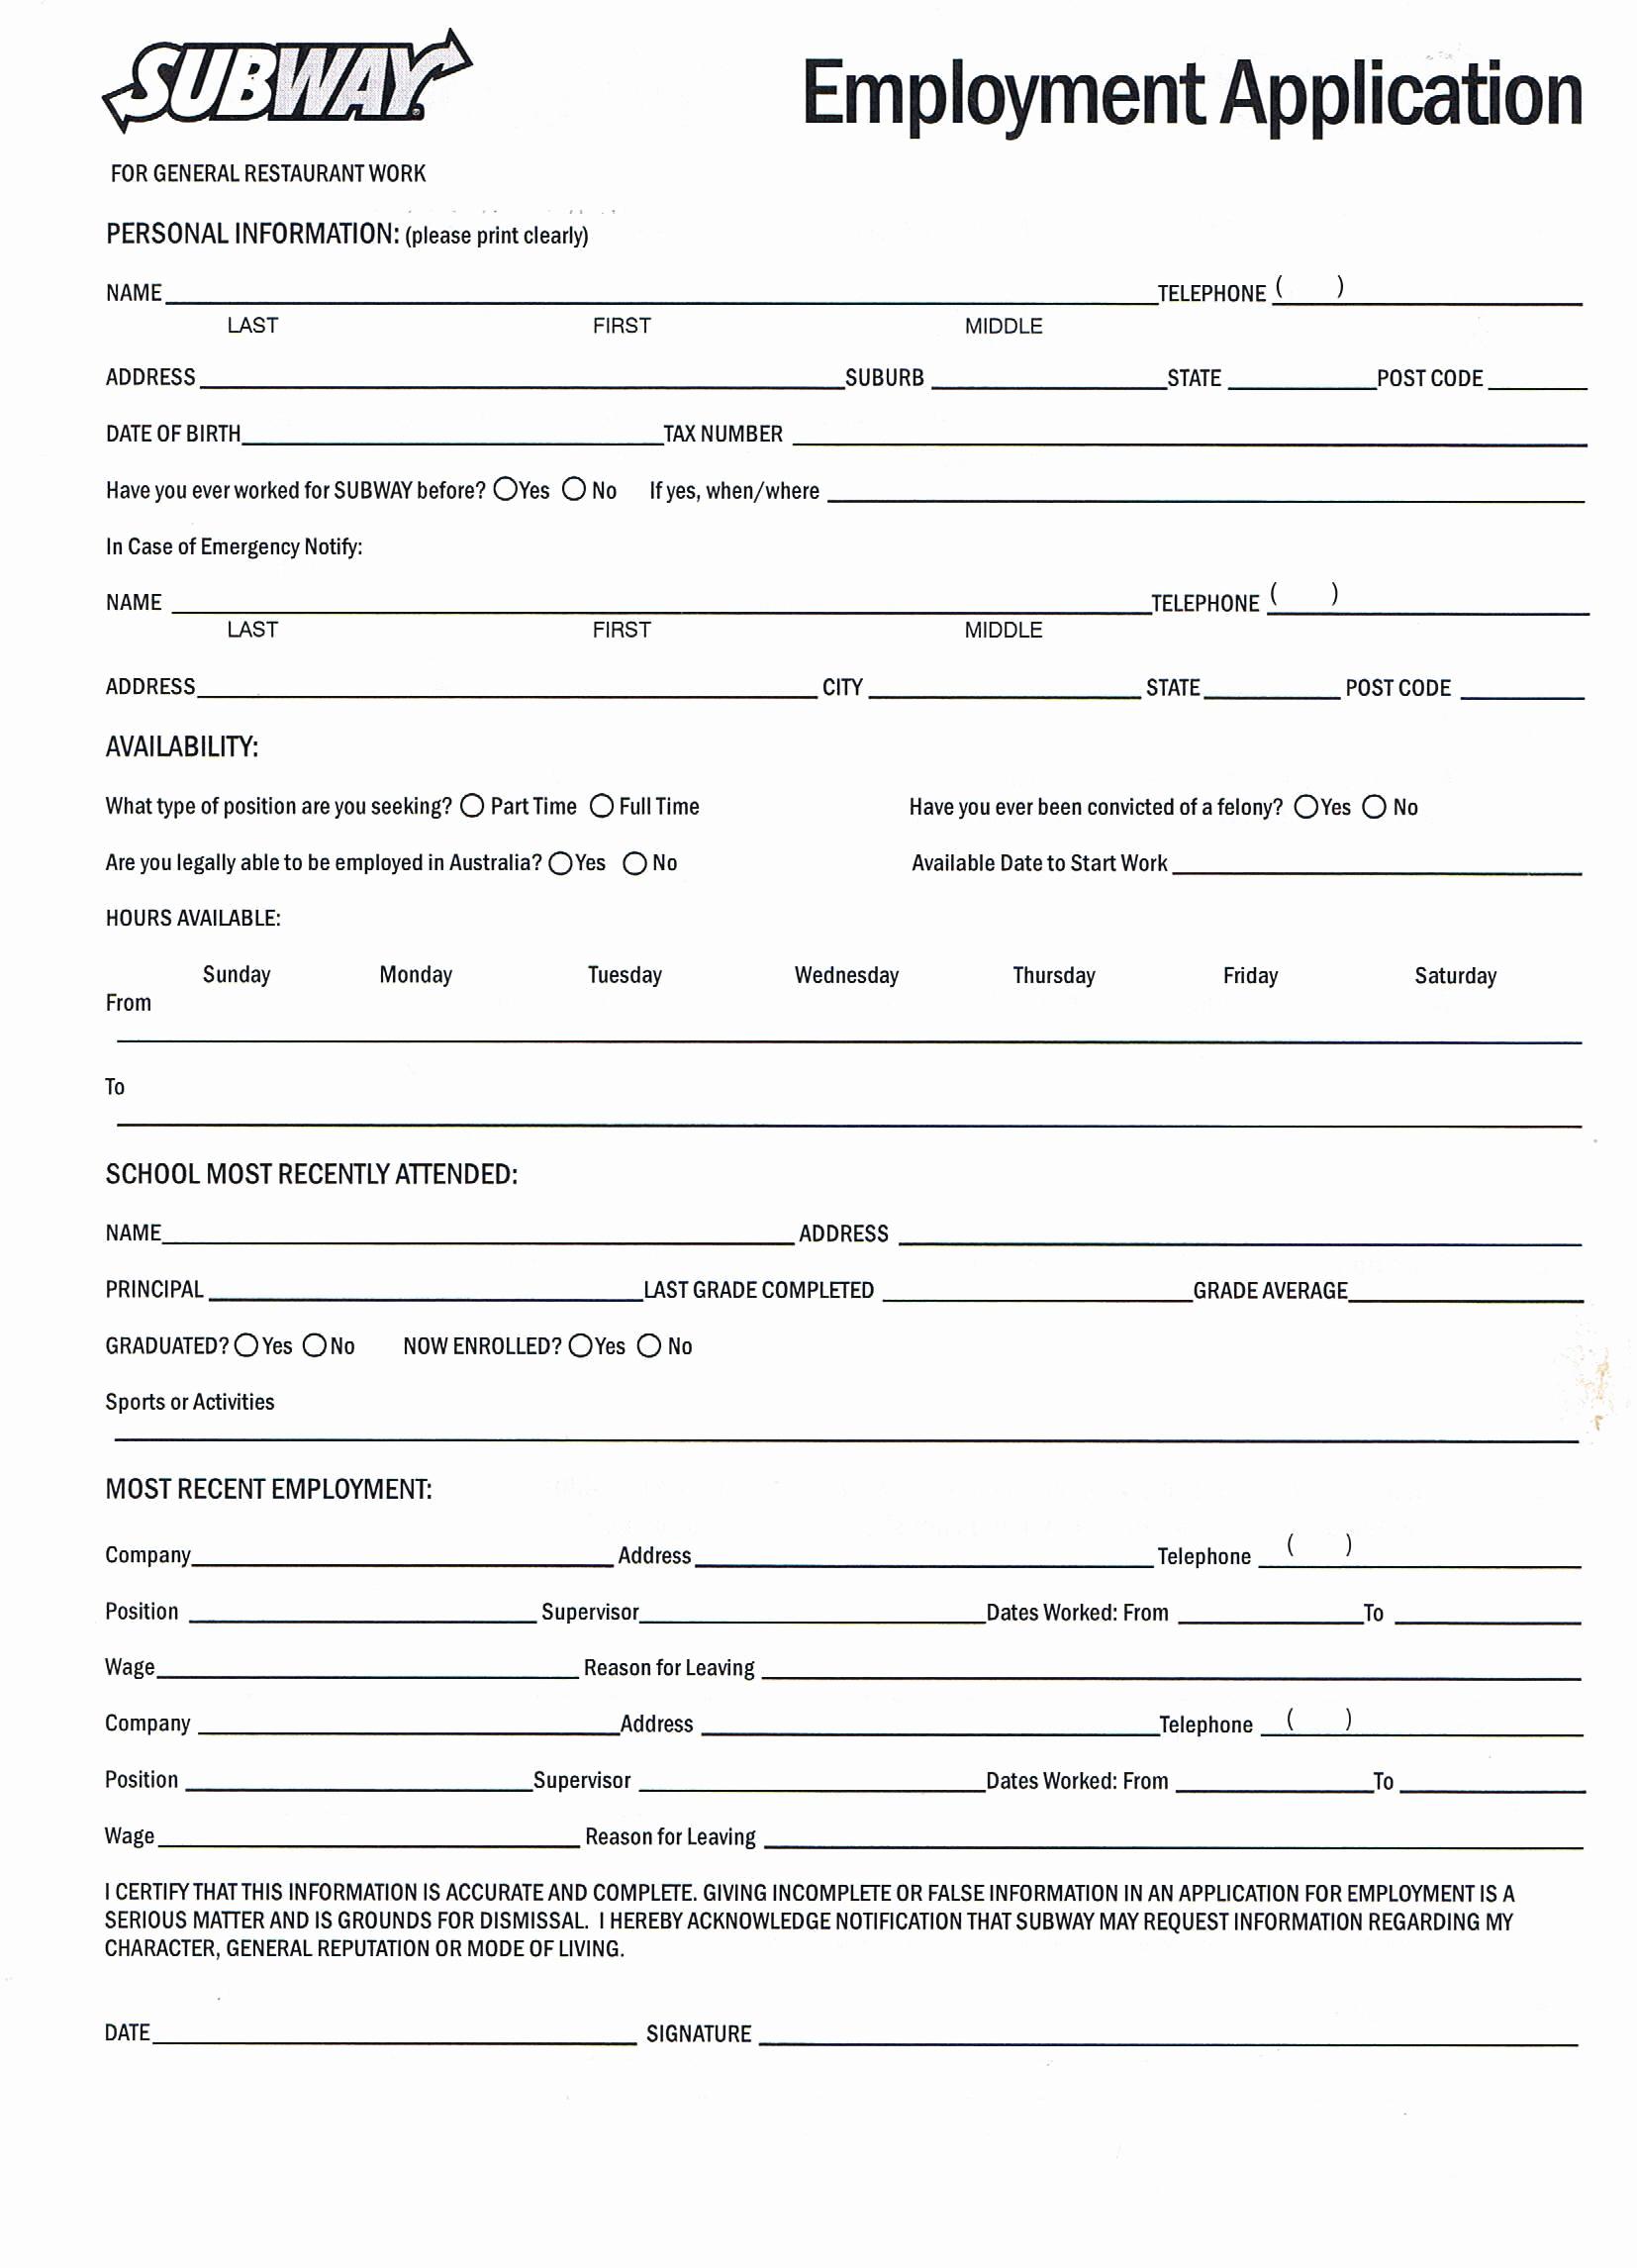 Job Application form Sample Luxury Printable Job Application forms Online forms Download and